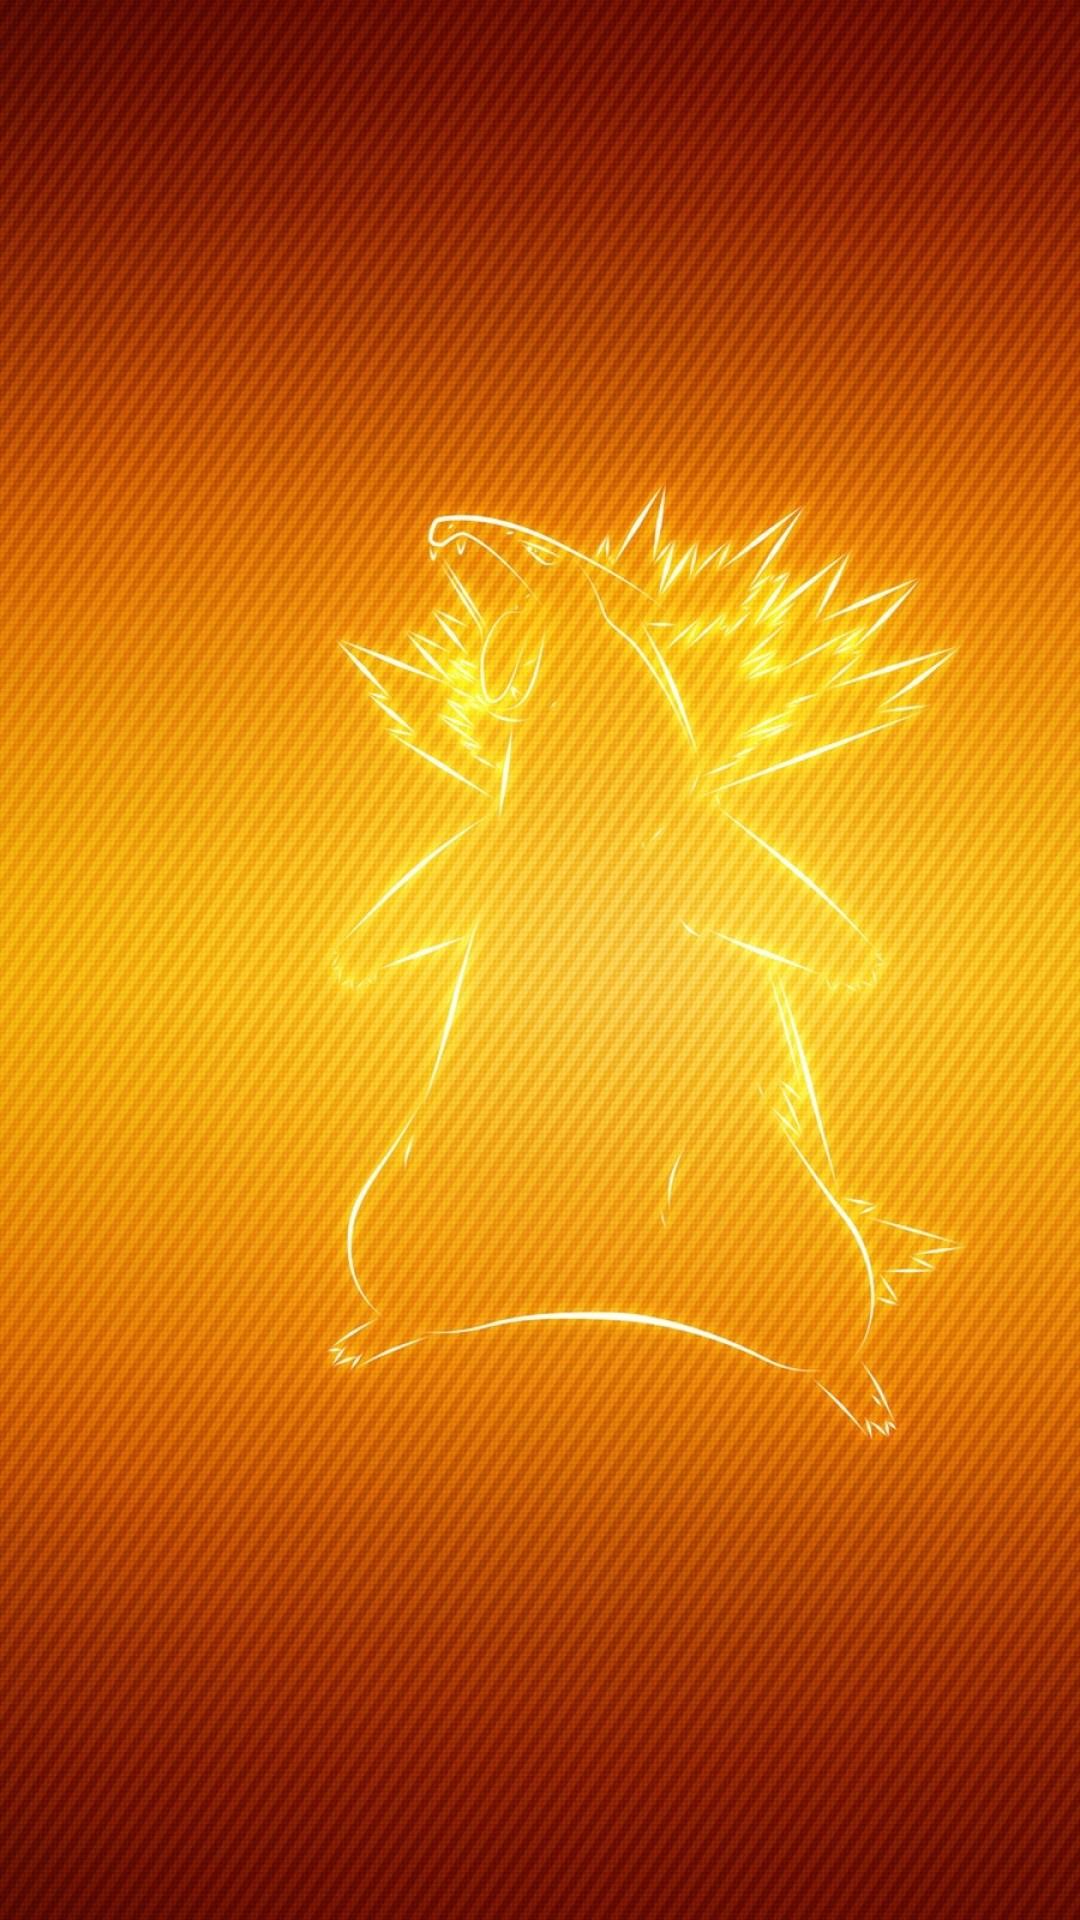 Preview wallpaper pokemon, typhlosion, badger 1080×1920